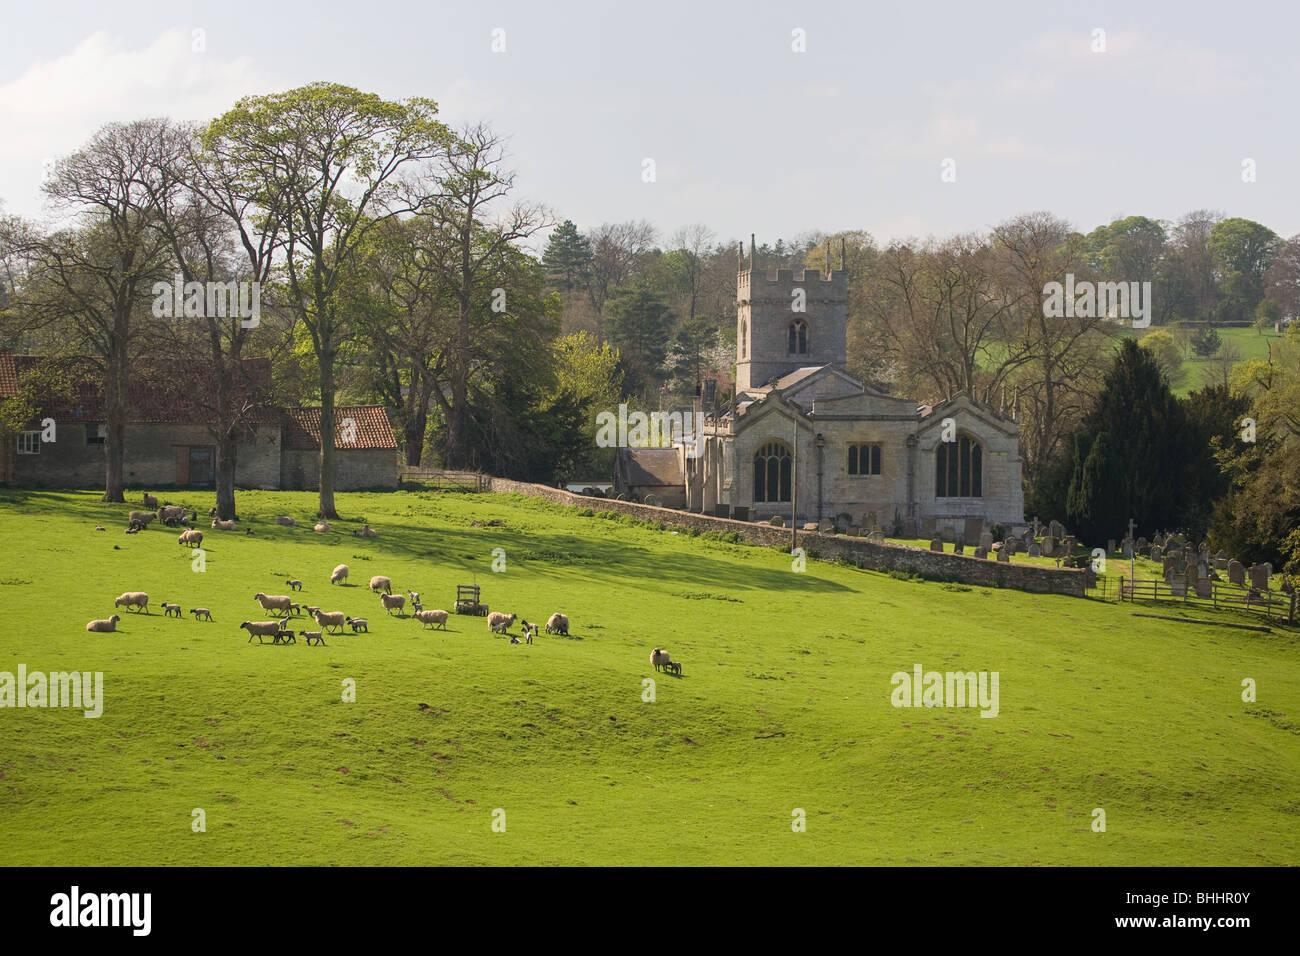 Pastoral English Landscape - Stock Image